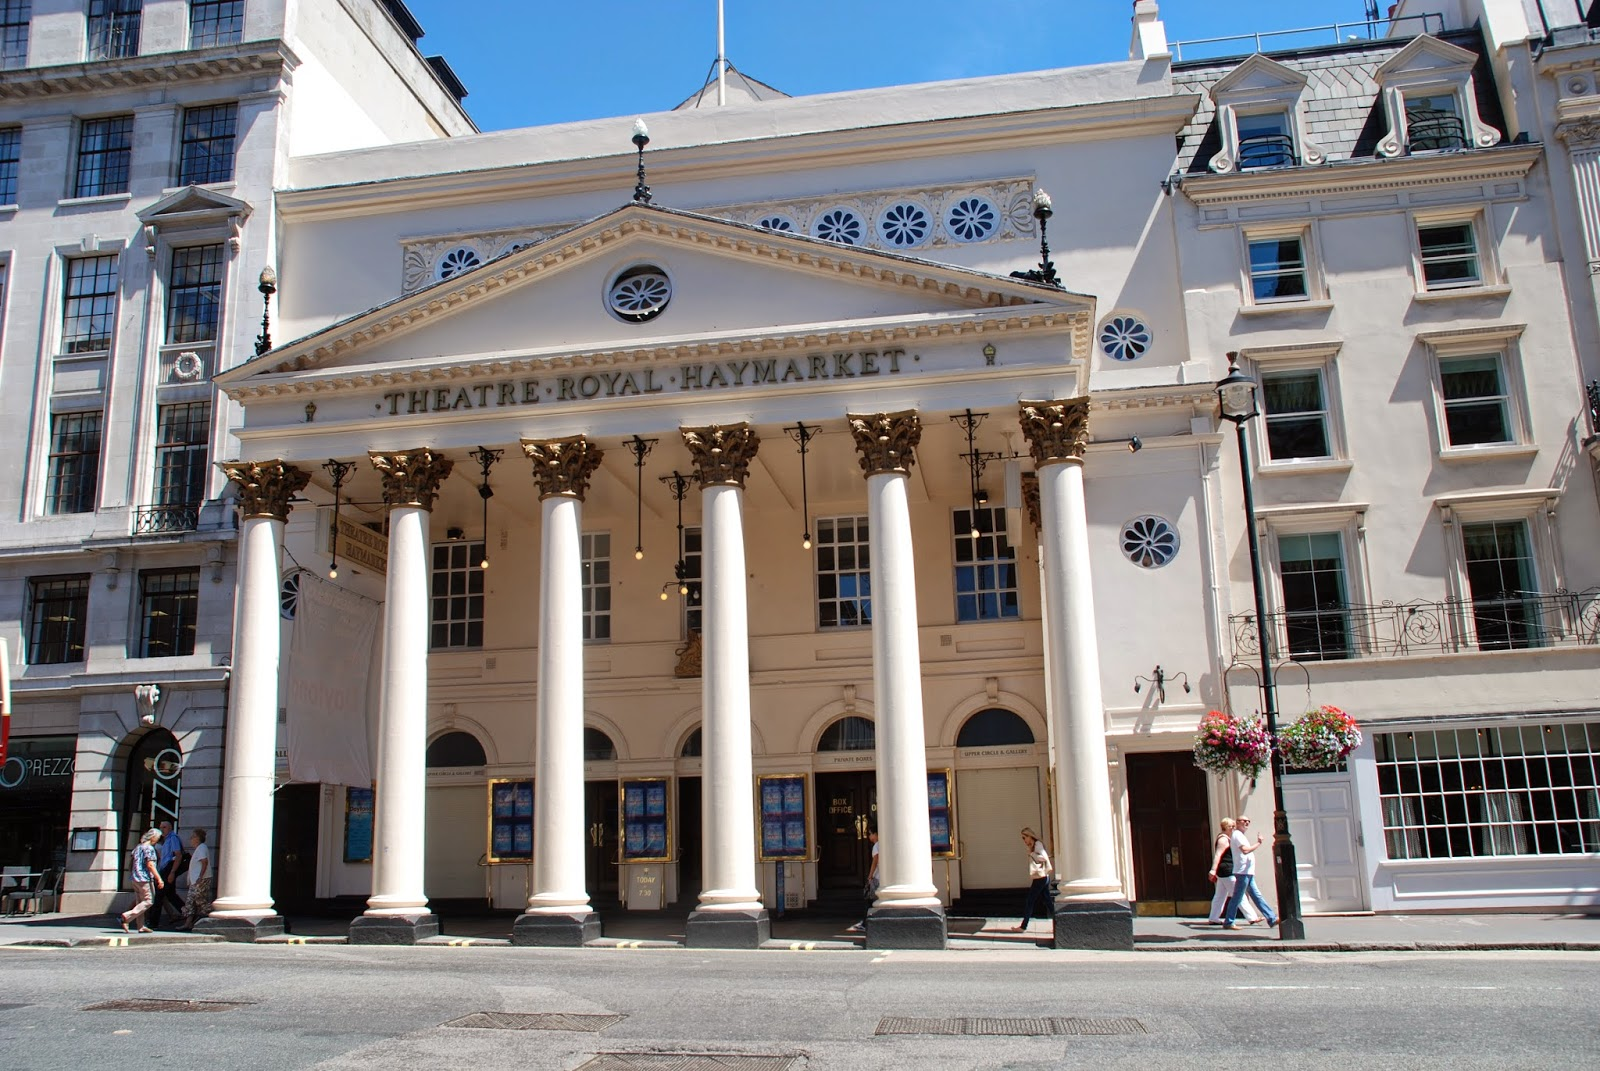 Theatre Royal Haymarket, London